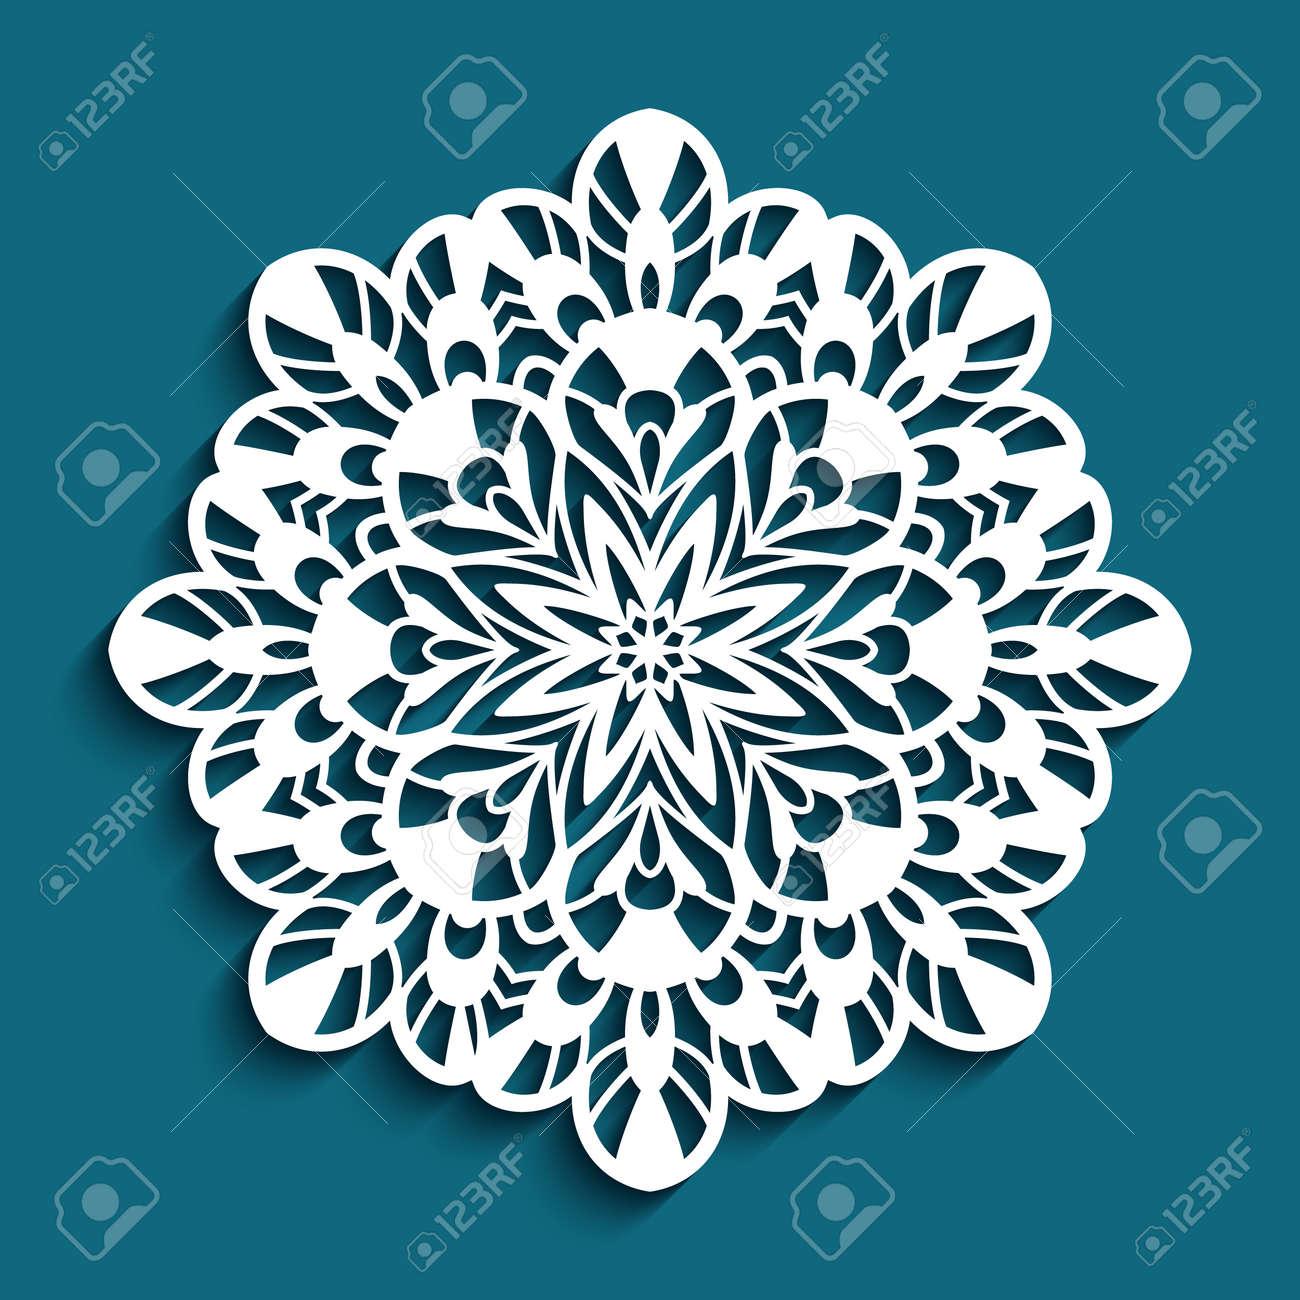 Round lace doily, Christmas ornament, cutout paper snowflake, crochet mandala circle pattern, swirly template for laser cutting - 155067123